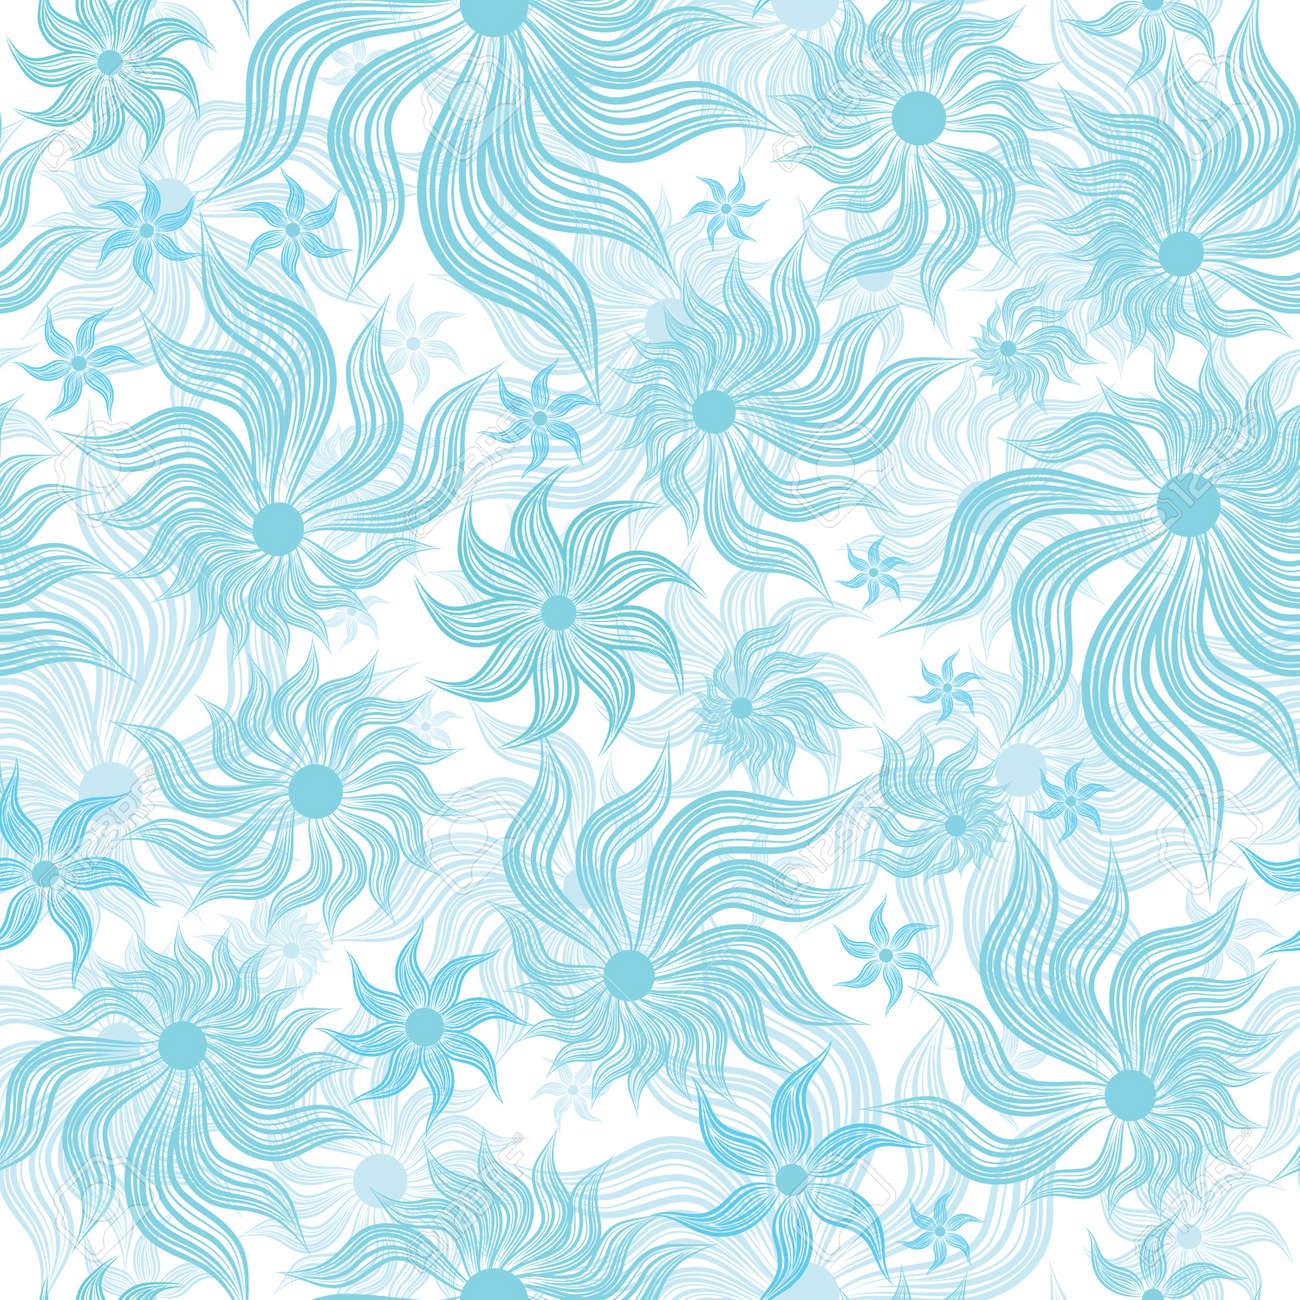 Abstract Art Blue Flower Seamless Background Pattern Floral Vintage Illustration Cute Filigree Wallpaper